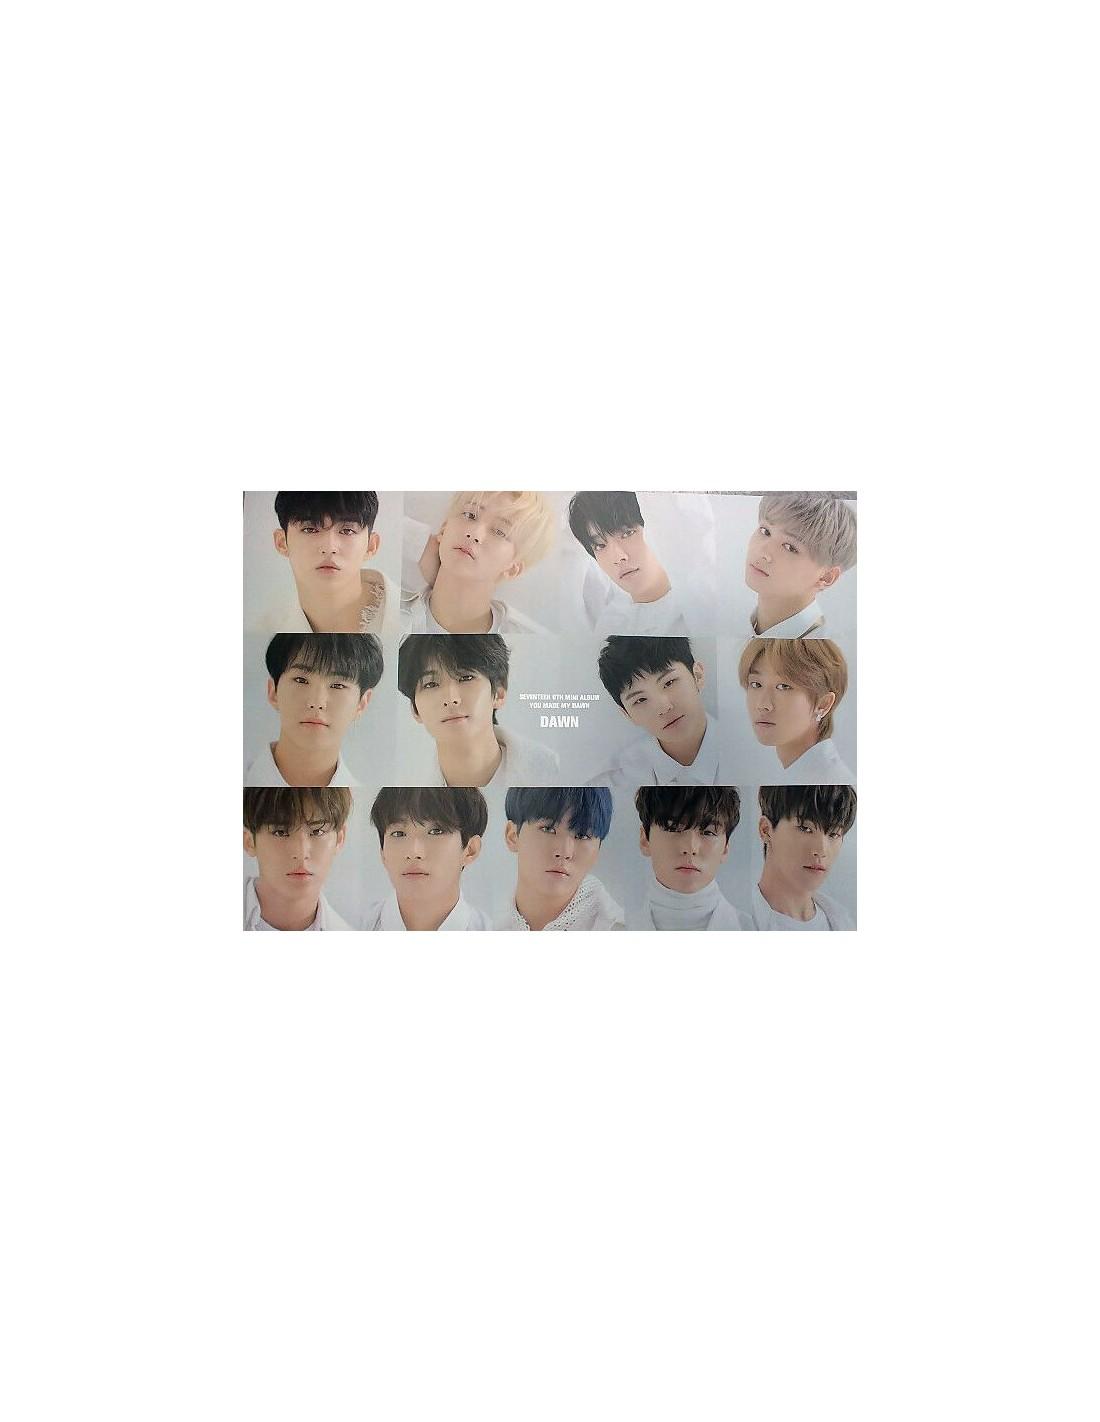 [Poster] SEVENTEEN 6th Mini Album - YOU MADE MY DAWN (DAWN VER)